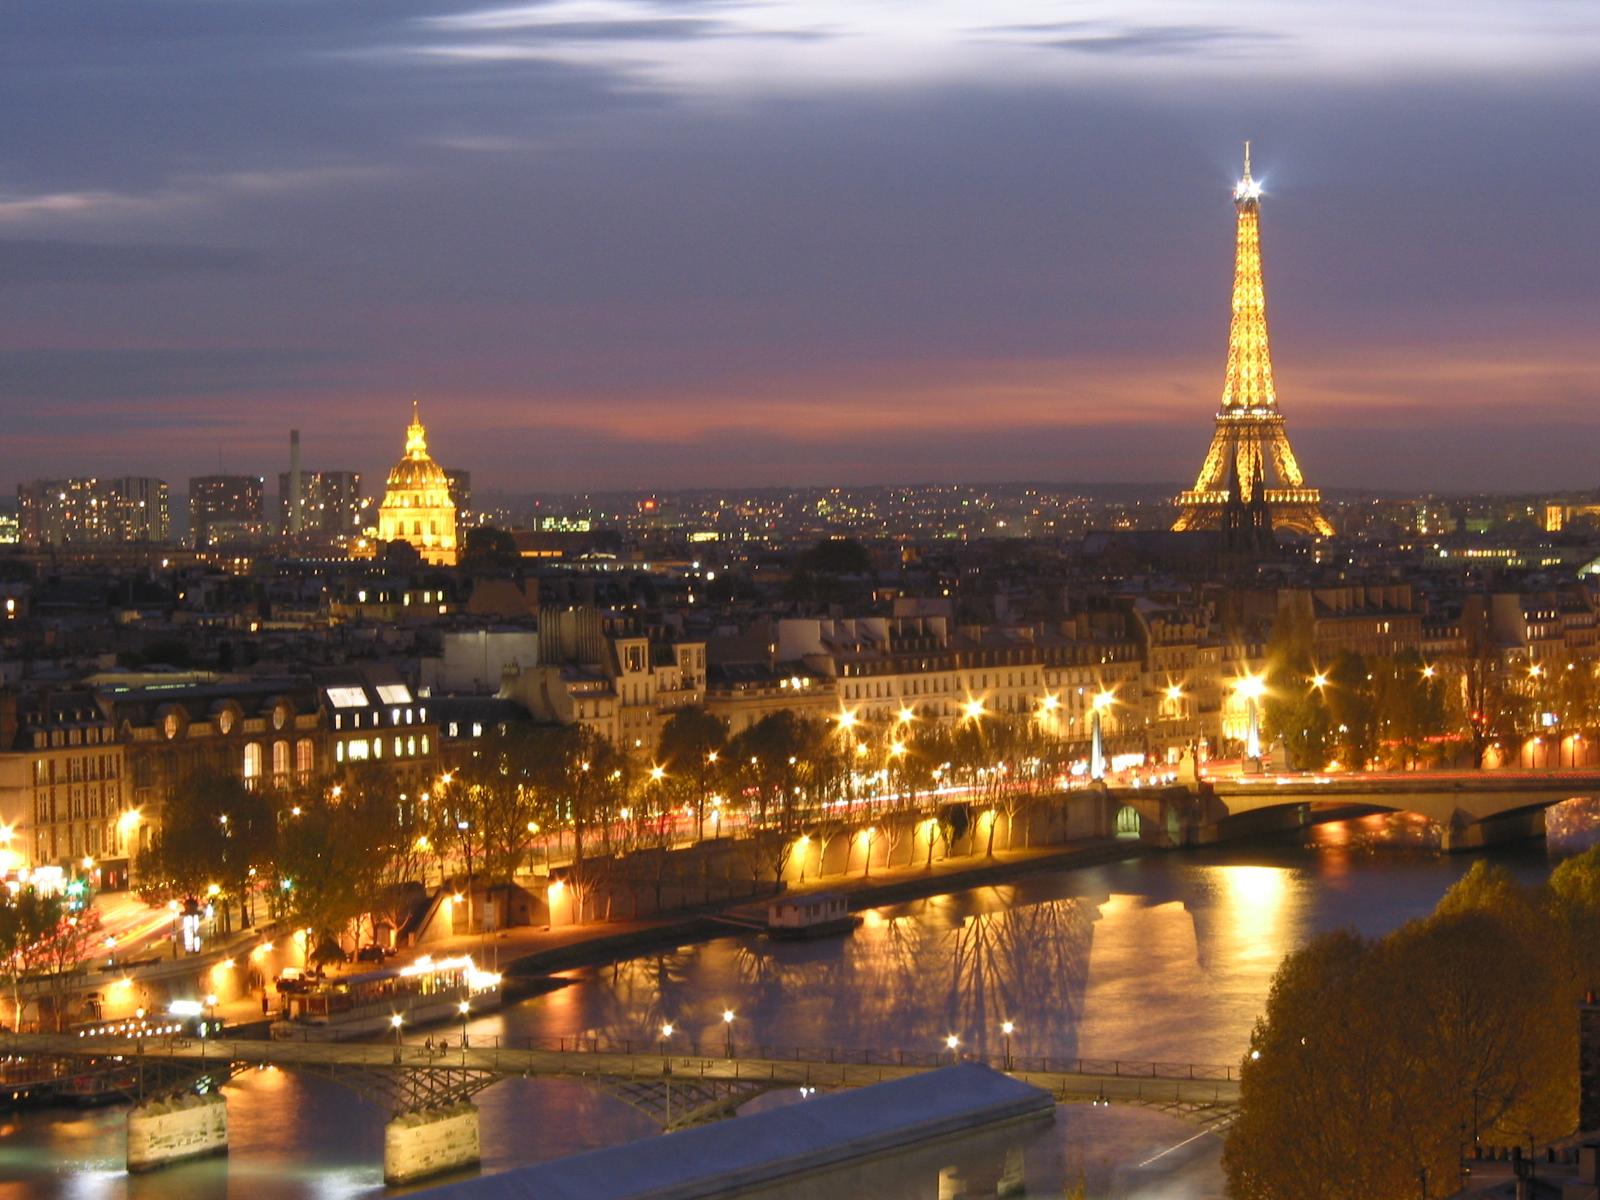 Ten reasons you should visit France in 2016